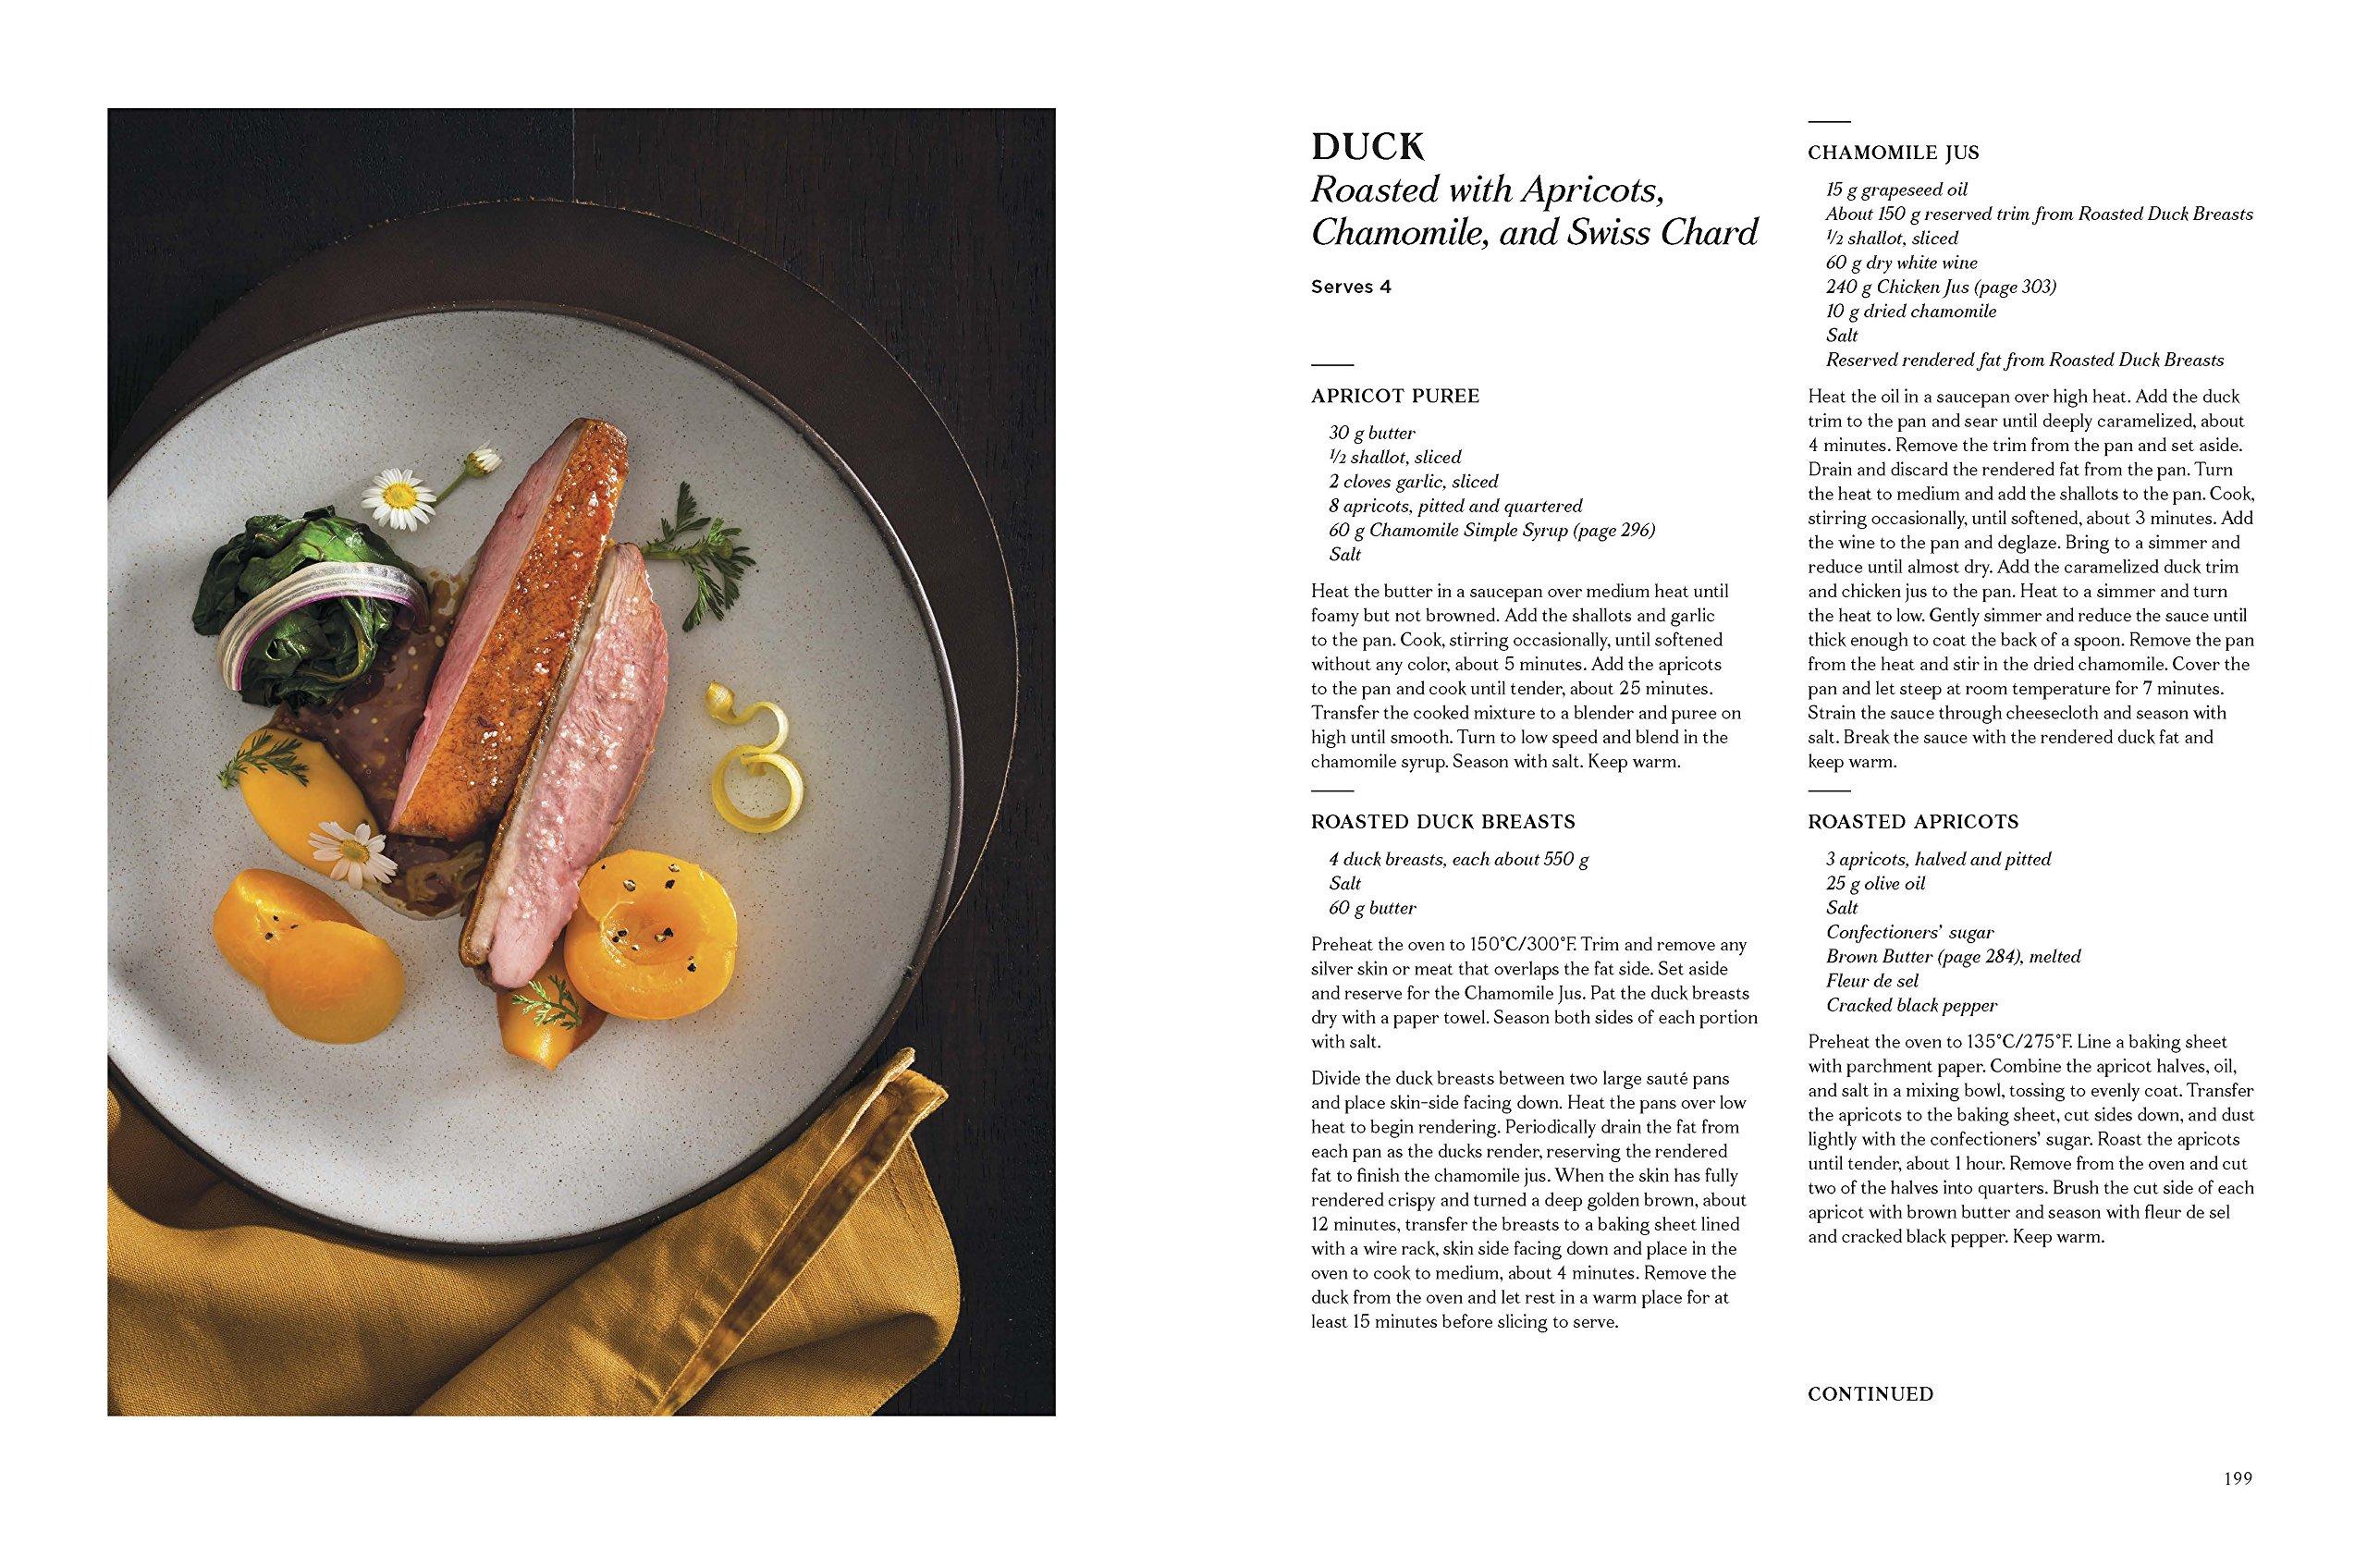 The nomad cookbook daniel humm will guidara leo robitschek the nomad cookbook daniel humm will guidara leo robitschek francesco tonelli 0787721912392 amazon books forumfinder Gallery